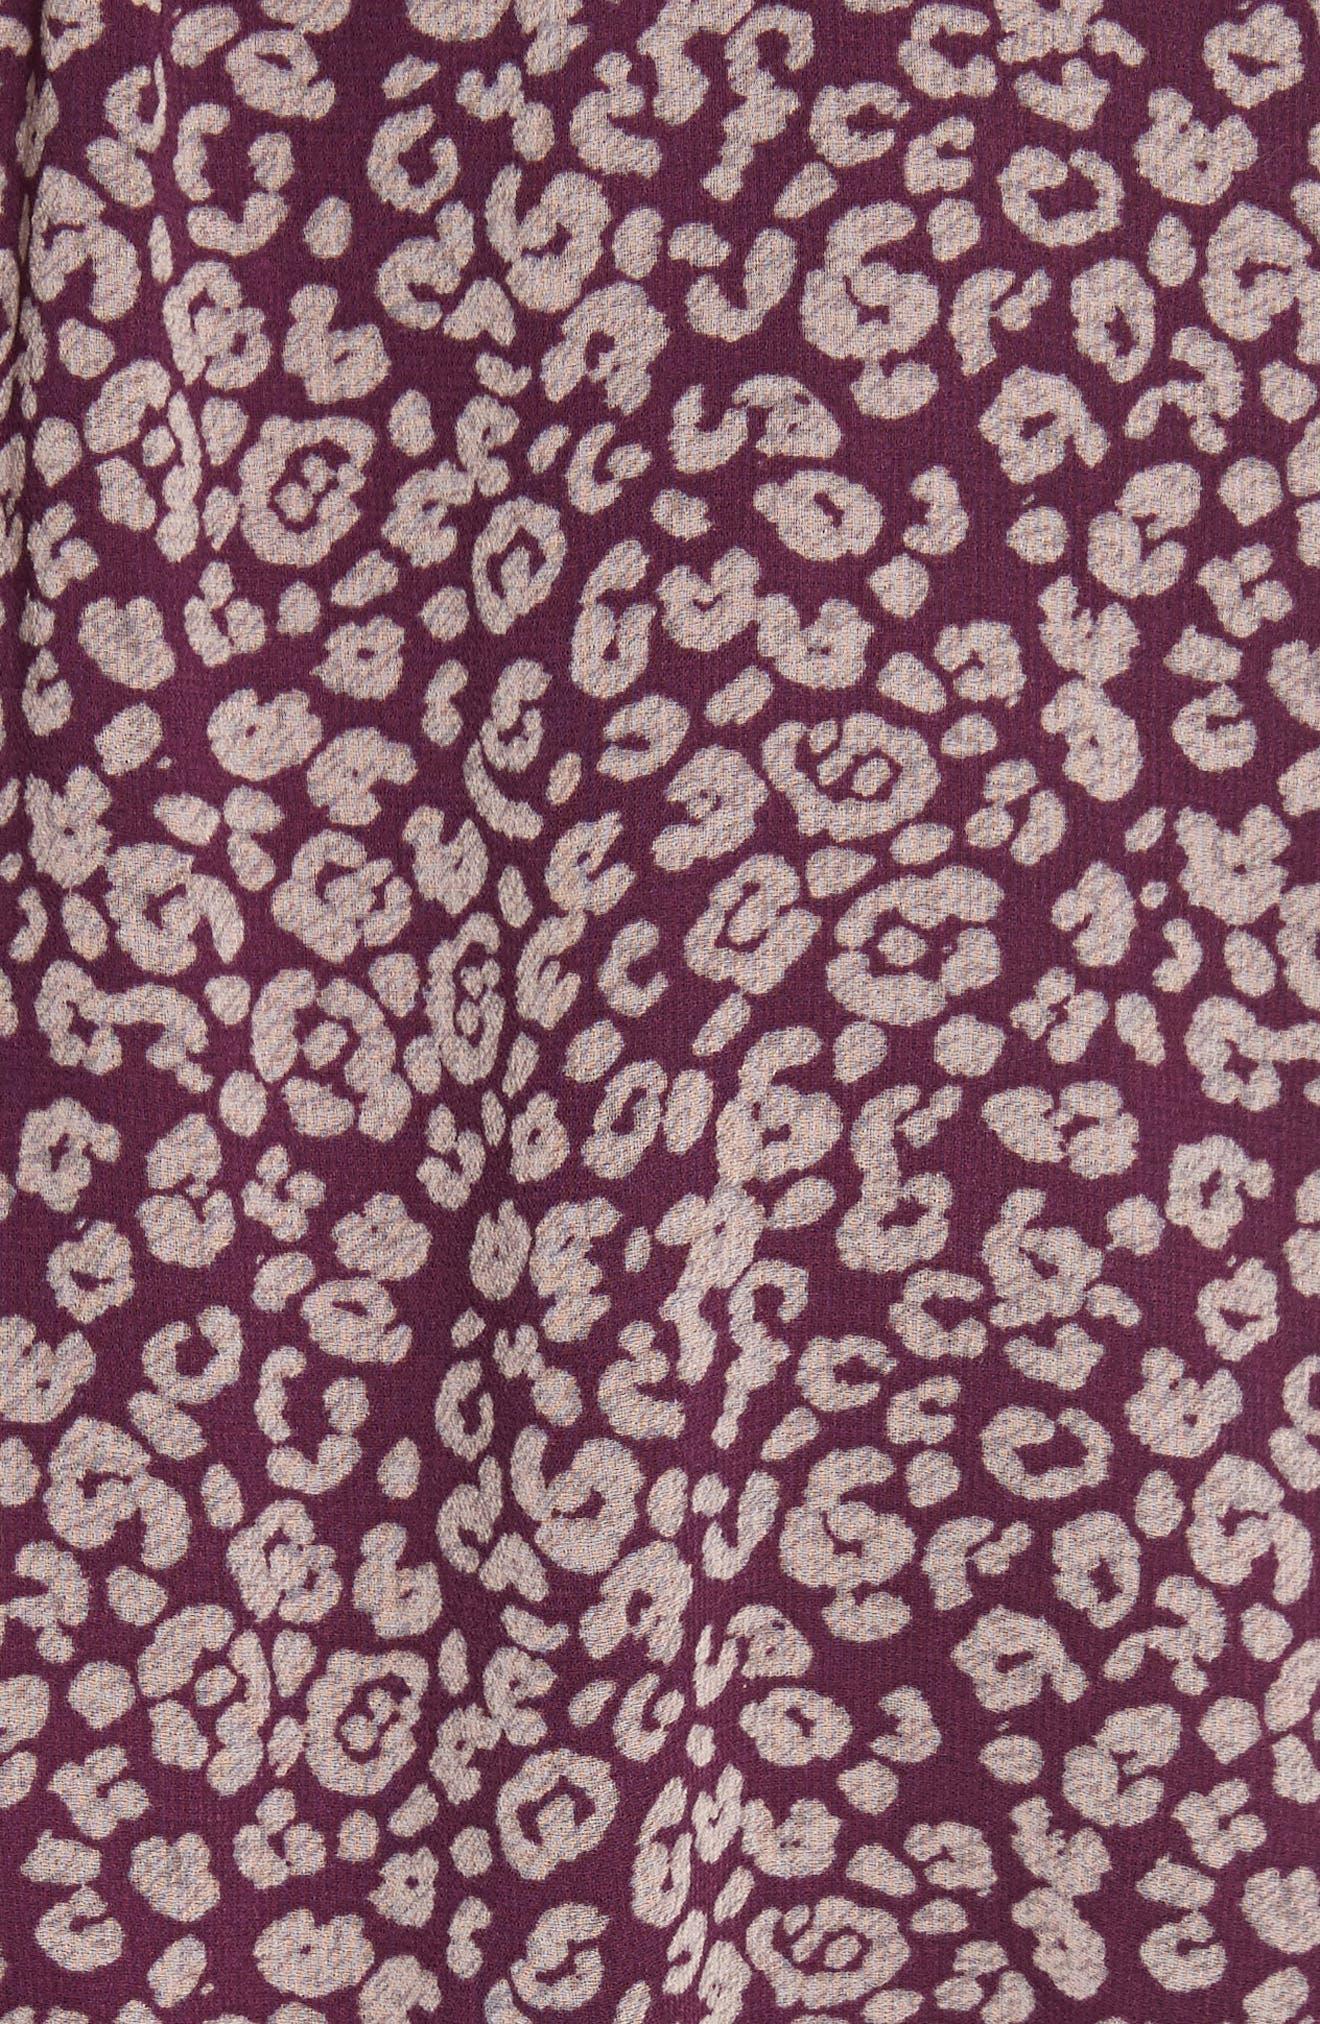 Rosemary A-Line Dress,                             Alternate thumbnail 5, color,                             Potent Purple Leopard